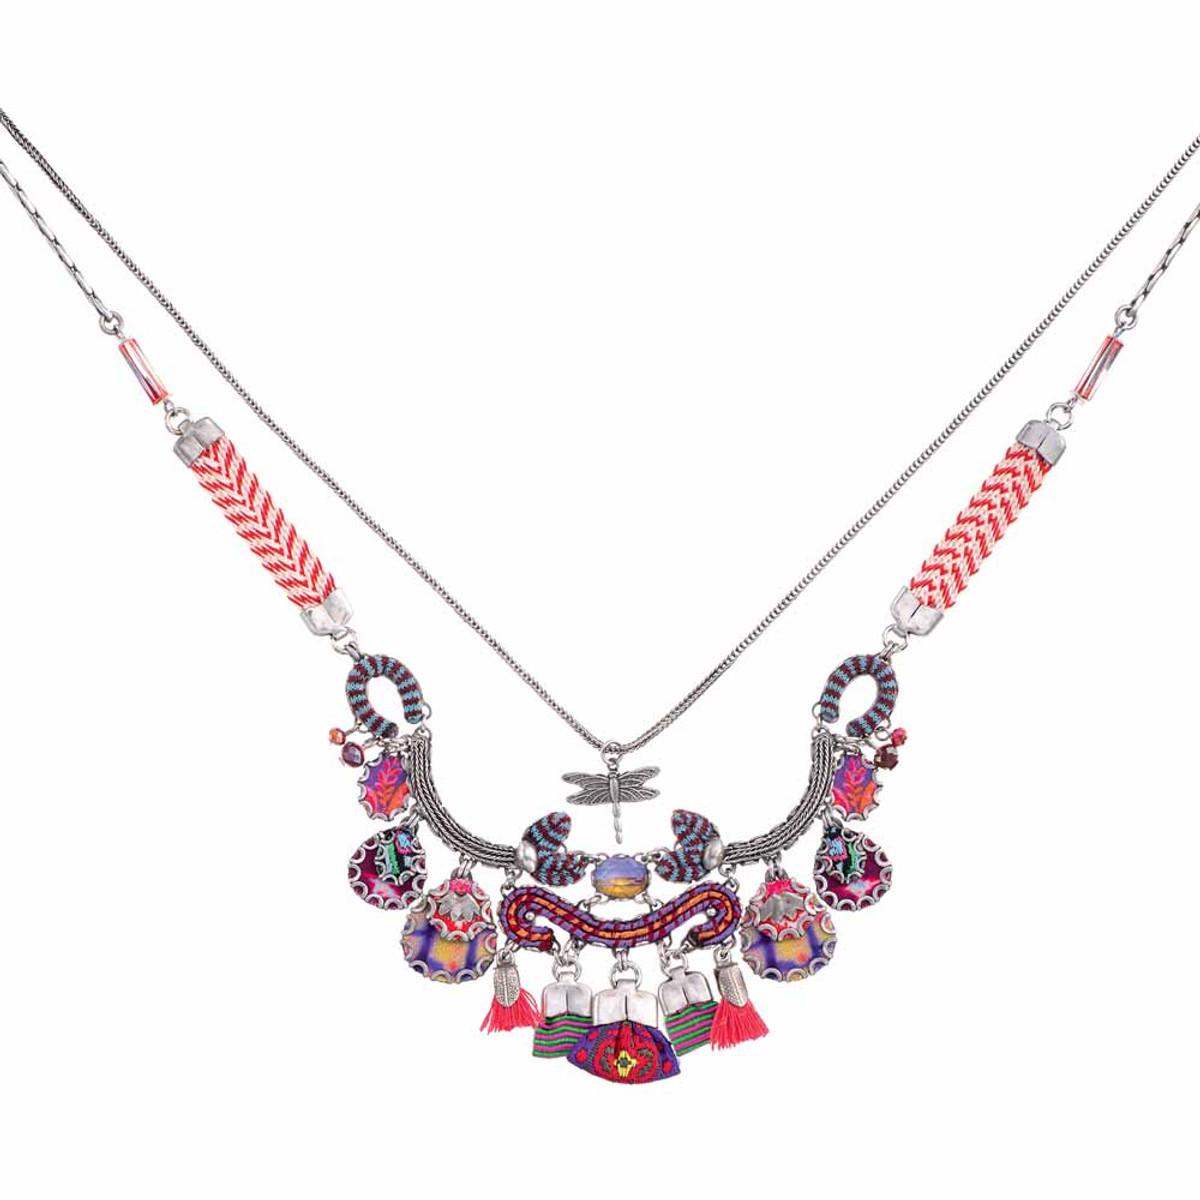 Ayala Bar Ruby Tuesday Mars Necklace